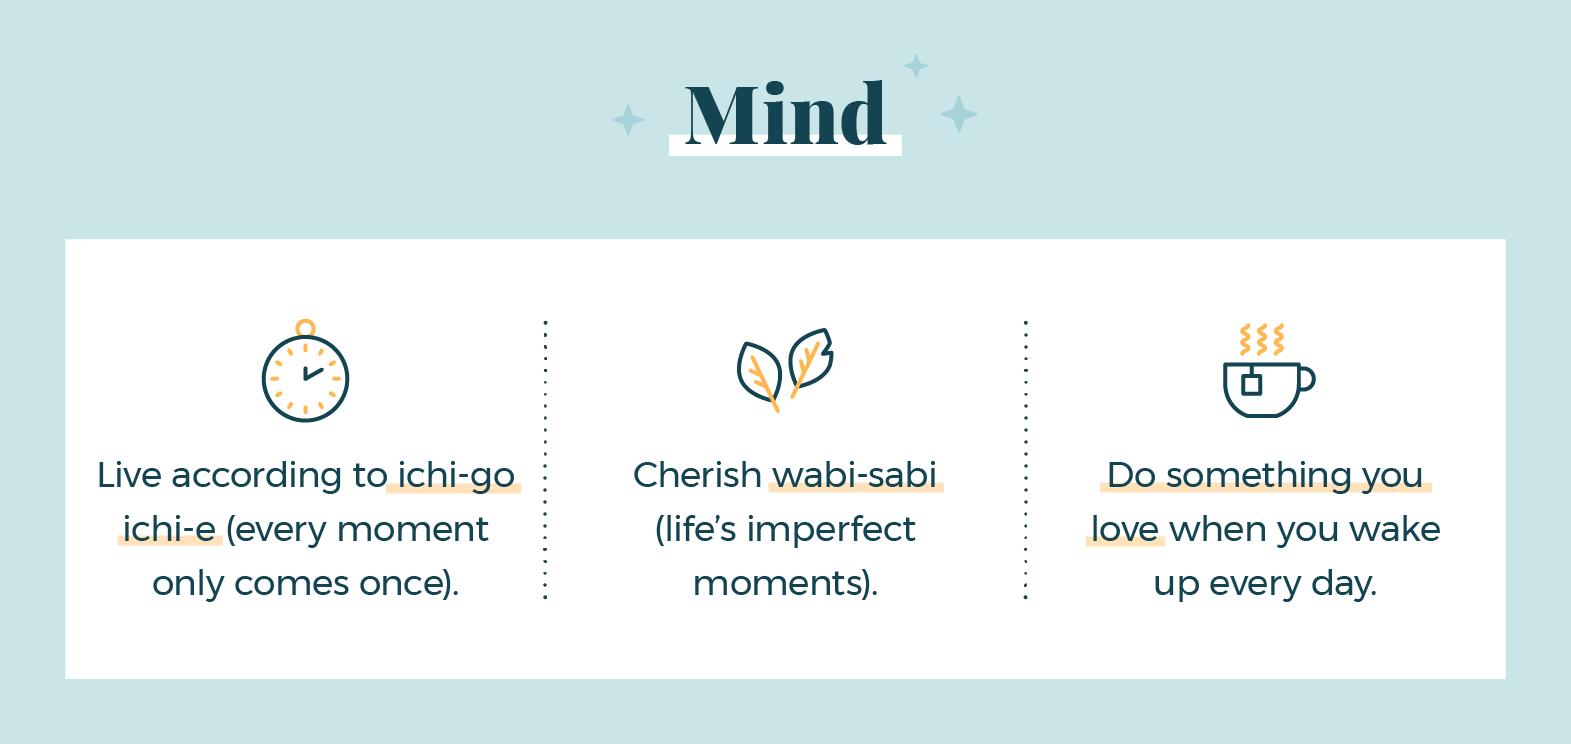 charcteristics-of-everyday-ikigai-mind